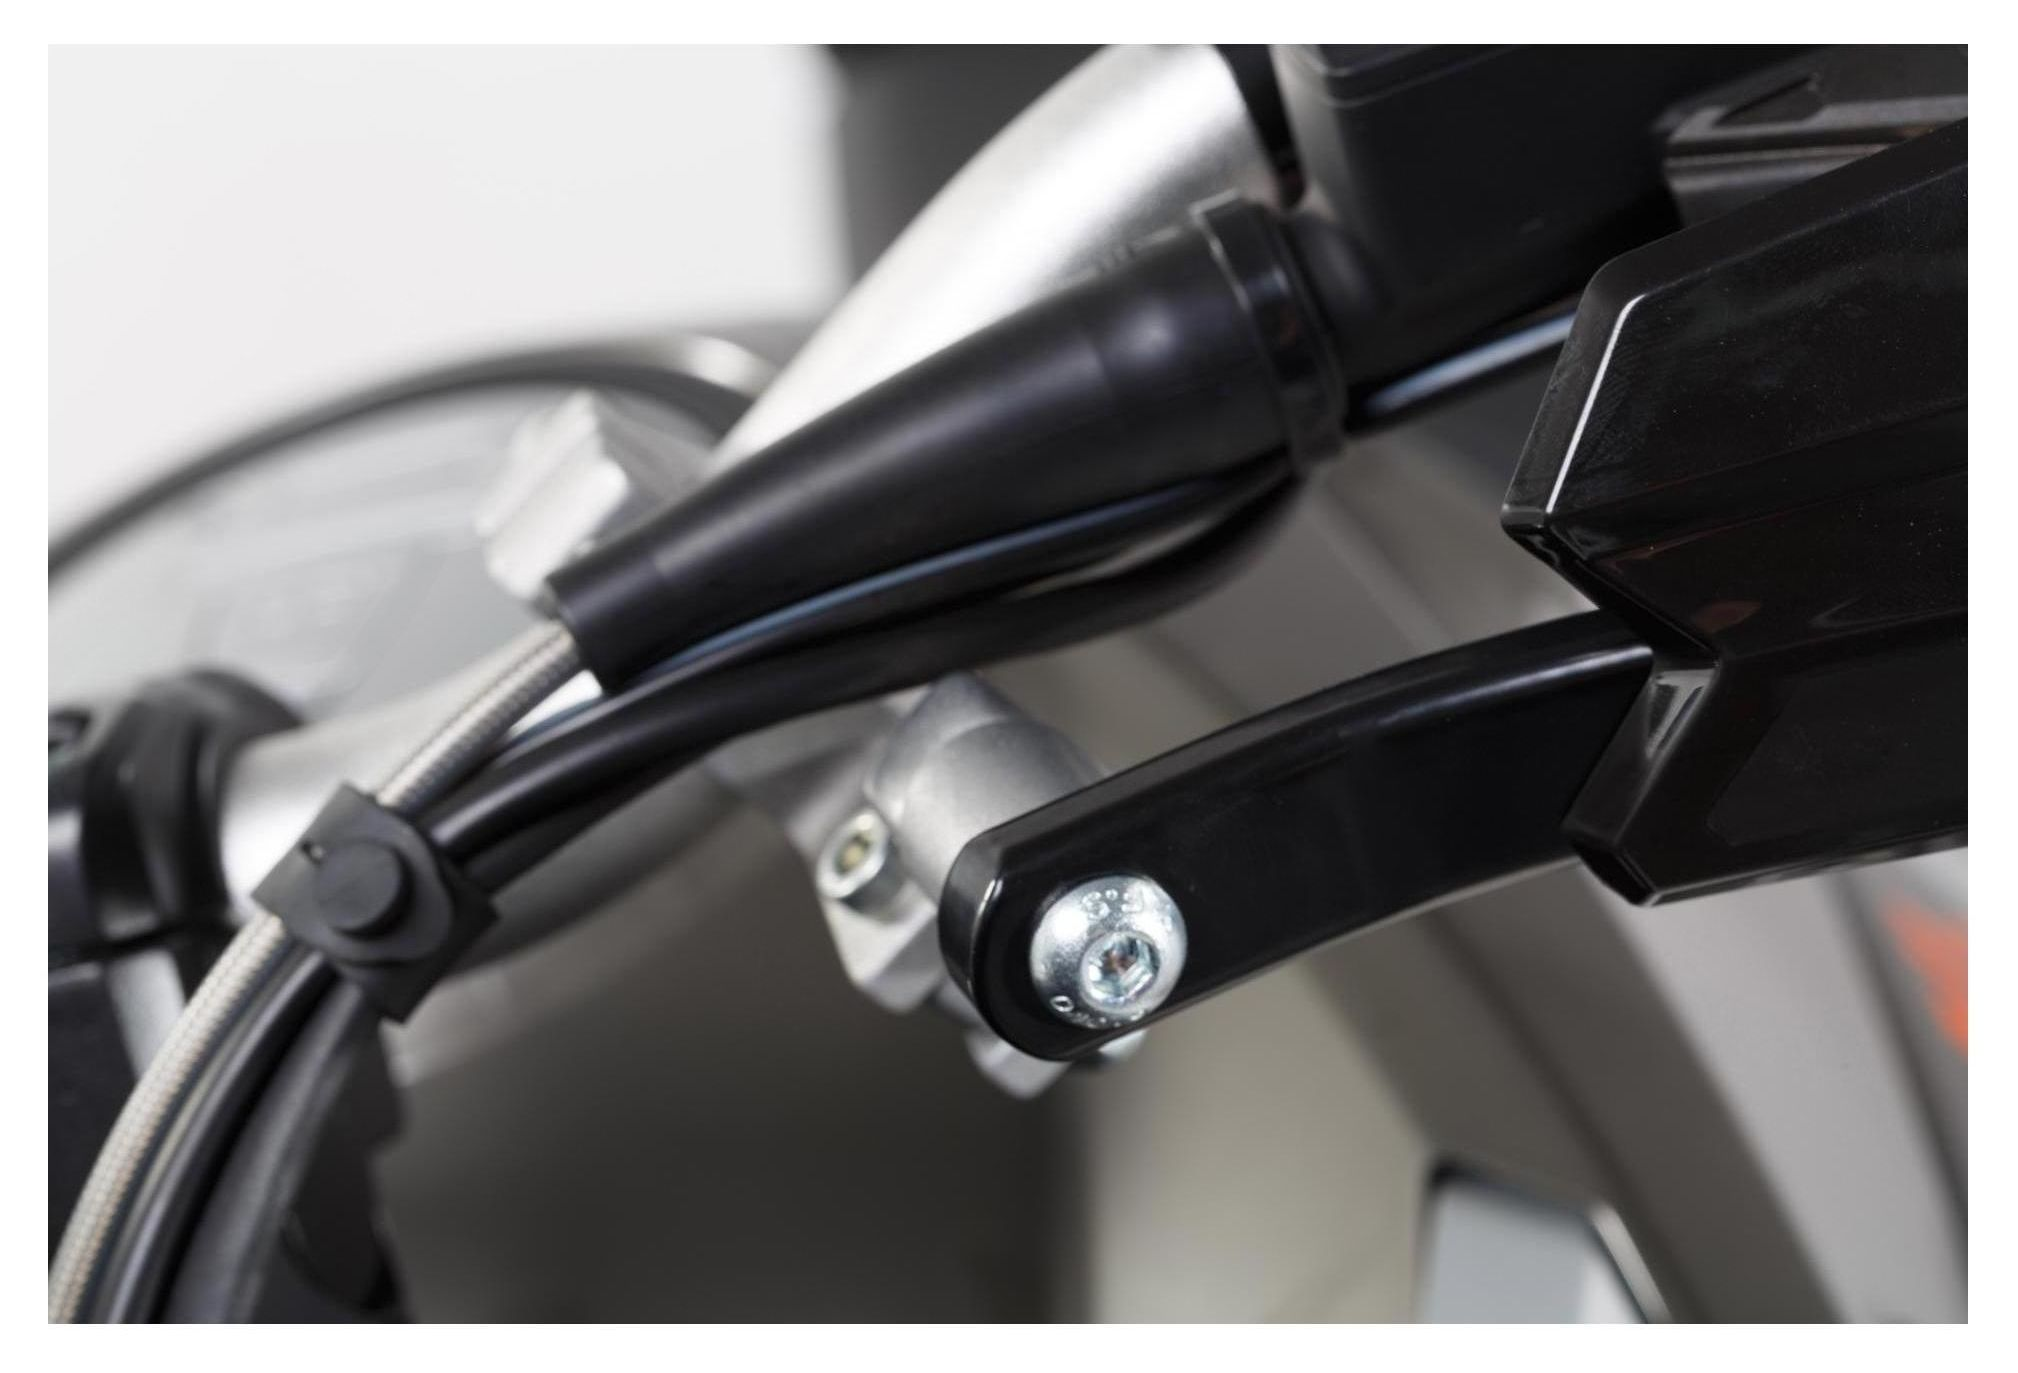 Sw Motech Kobra Handguard Kit Ktm 1190 Adventure R 2013 2015 640 Lc4 Wiring Diagram 2003 Revzilla